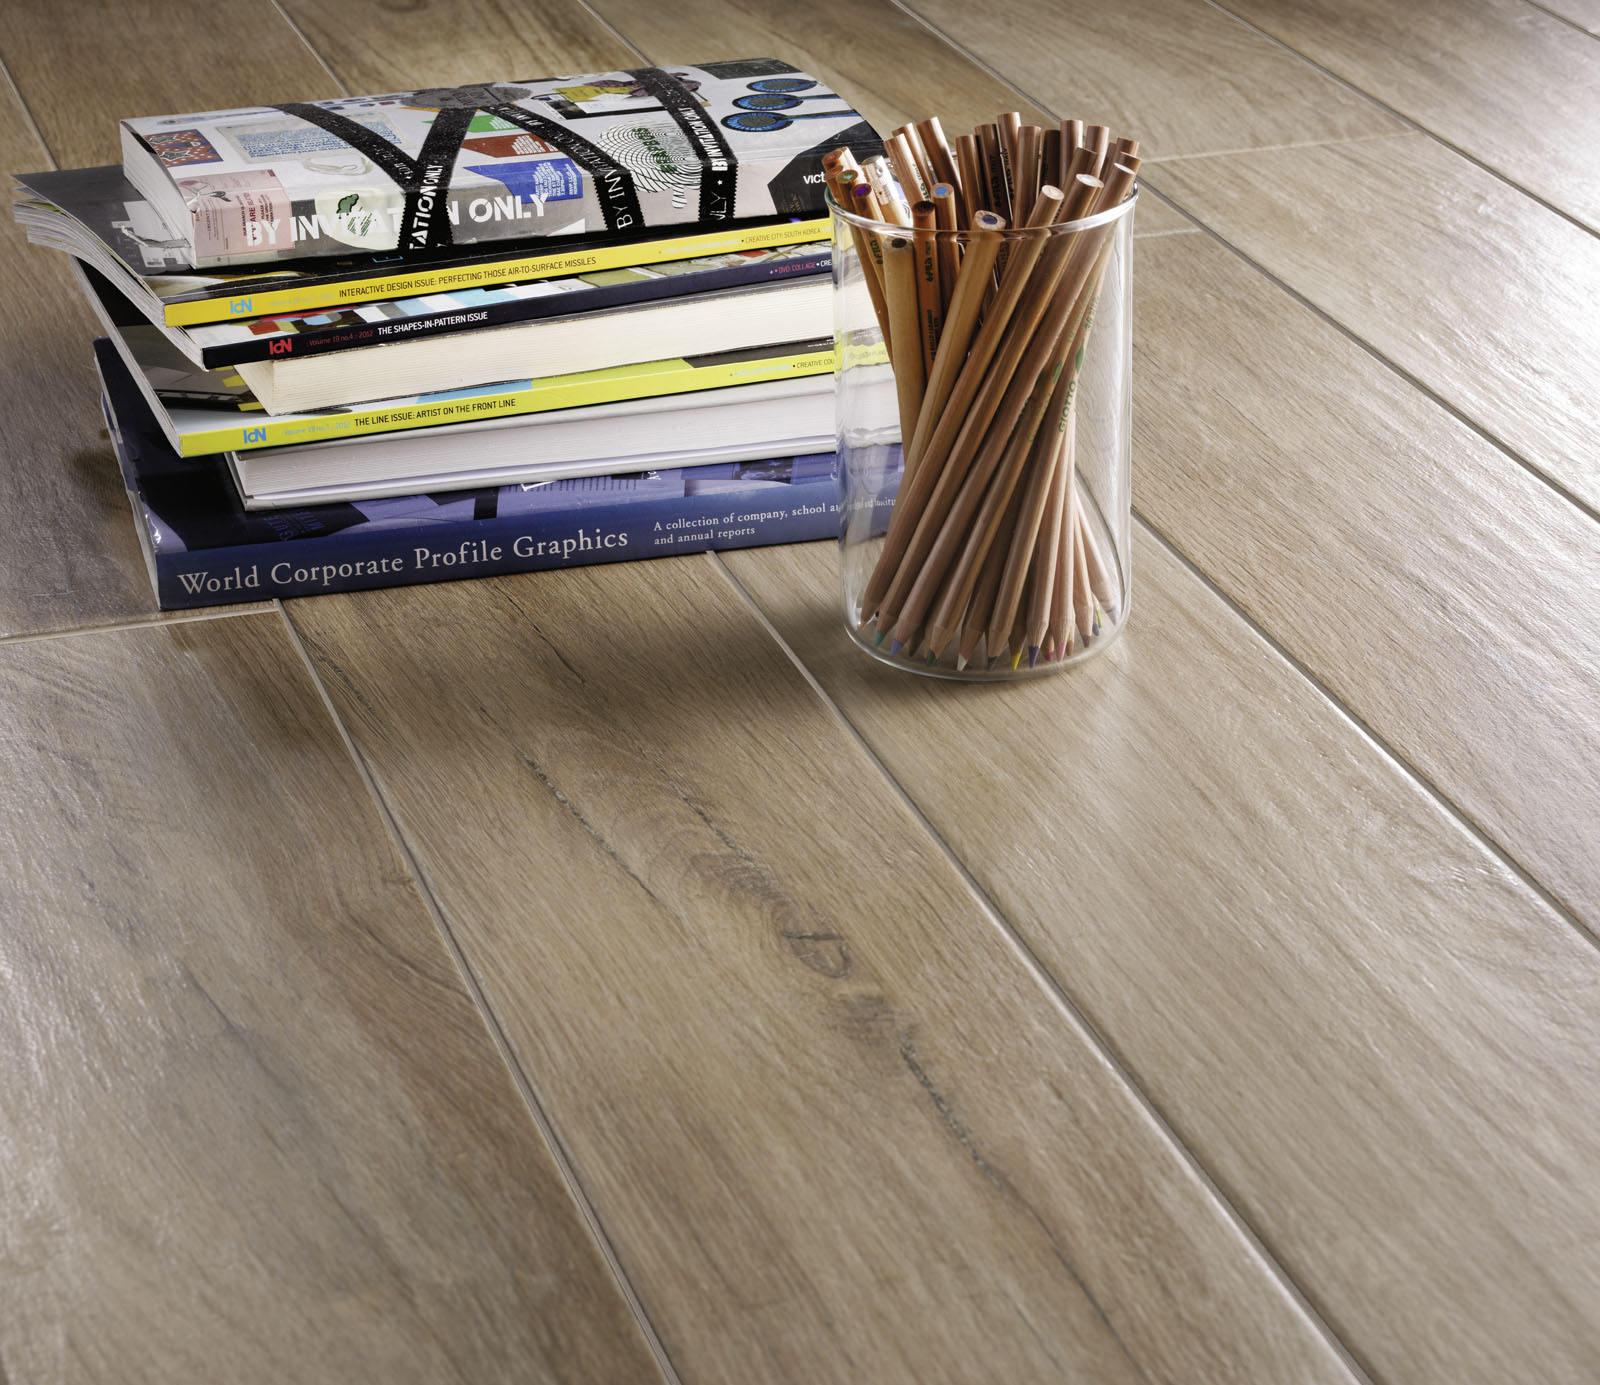 Küchenboden In Betonoptik: Fliesen In Holzoptik